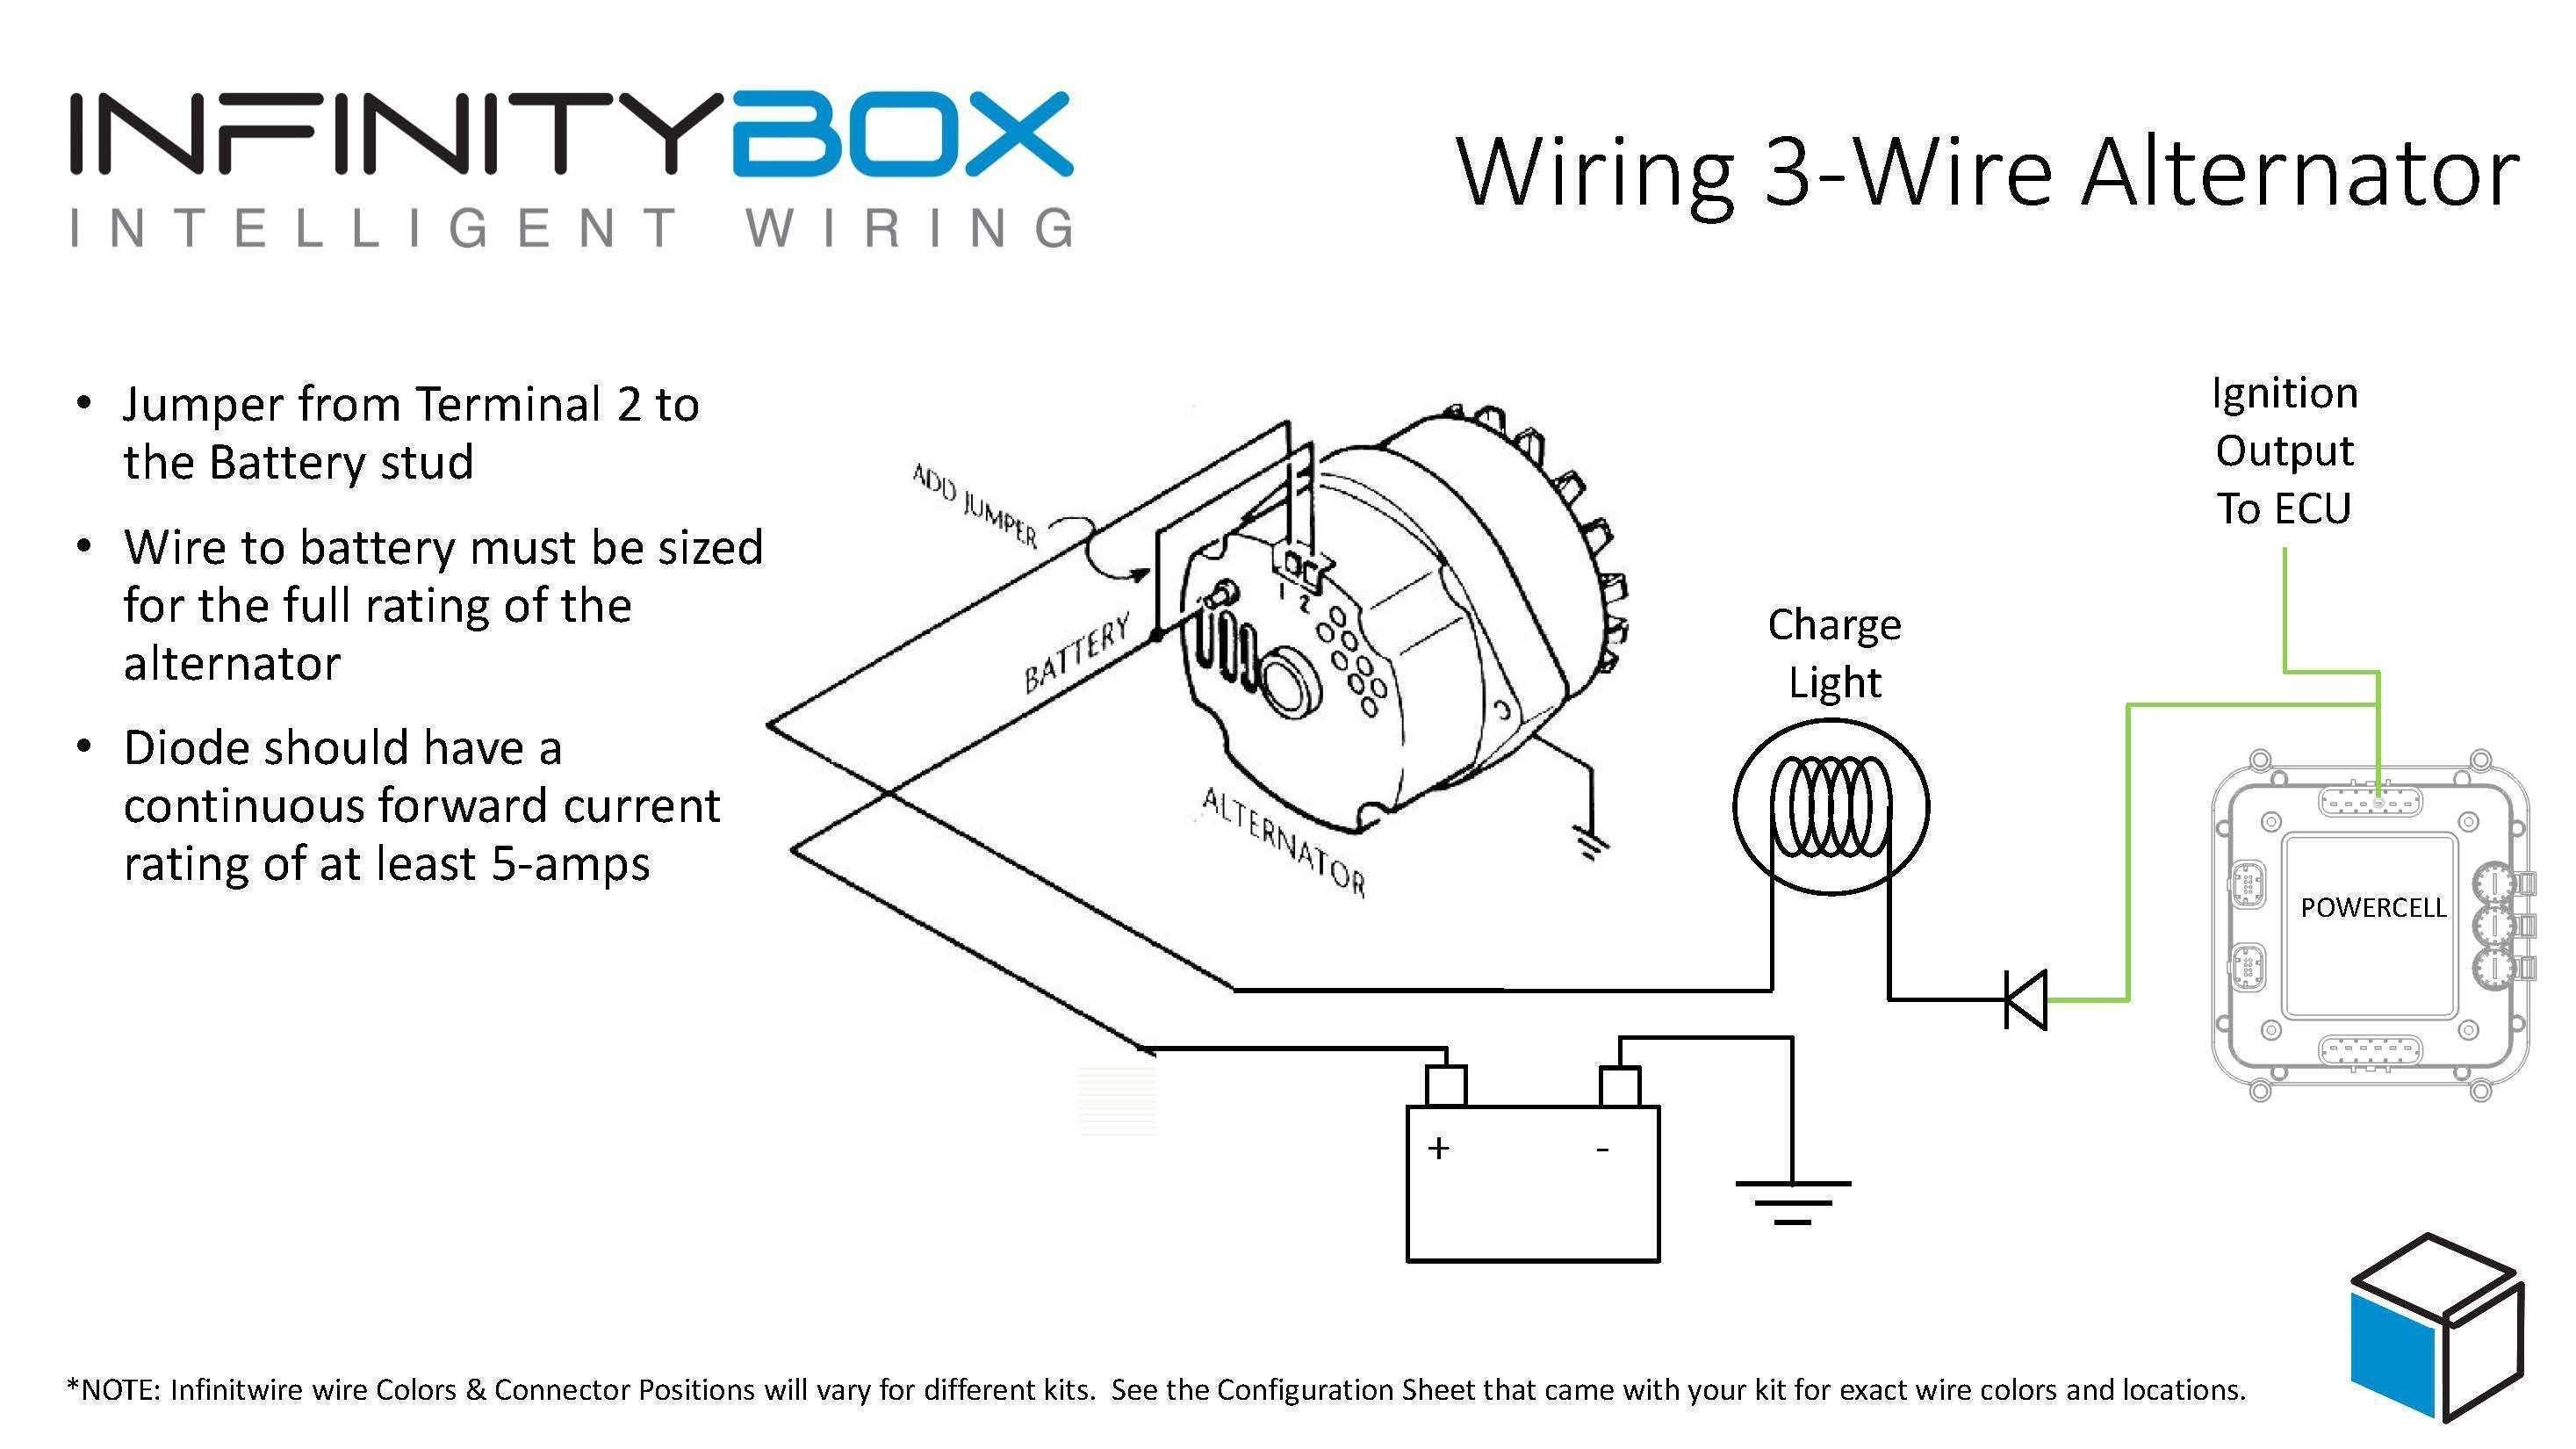 Alternator Parts Diagram Alternator Parts Diagram Trusted Wiring Diagrams Of Alternator Parts Diagram Alternator Wiring Diagram Image